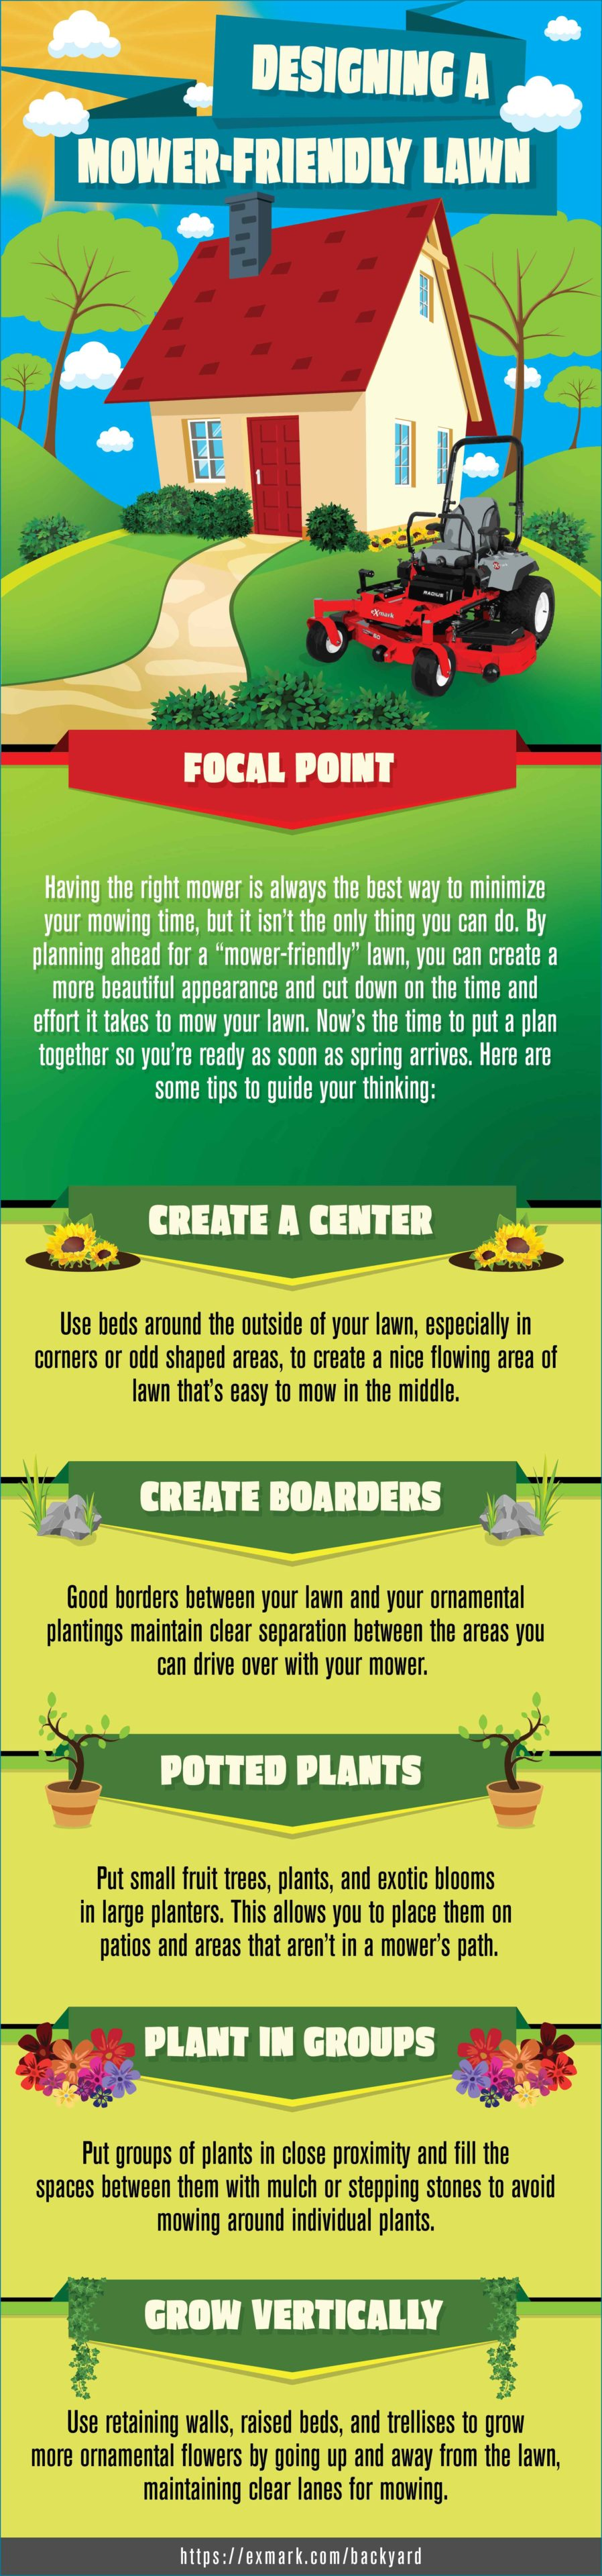 Mower Friendly Lawn Tips